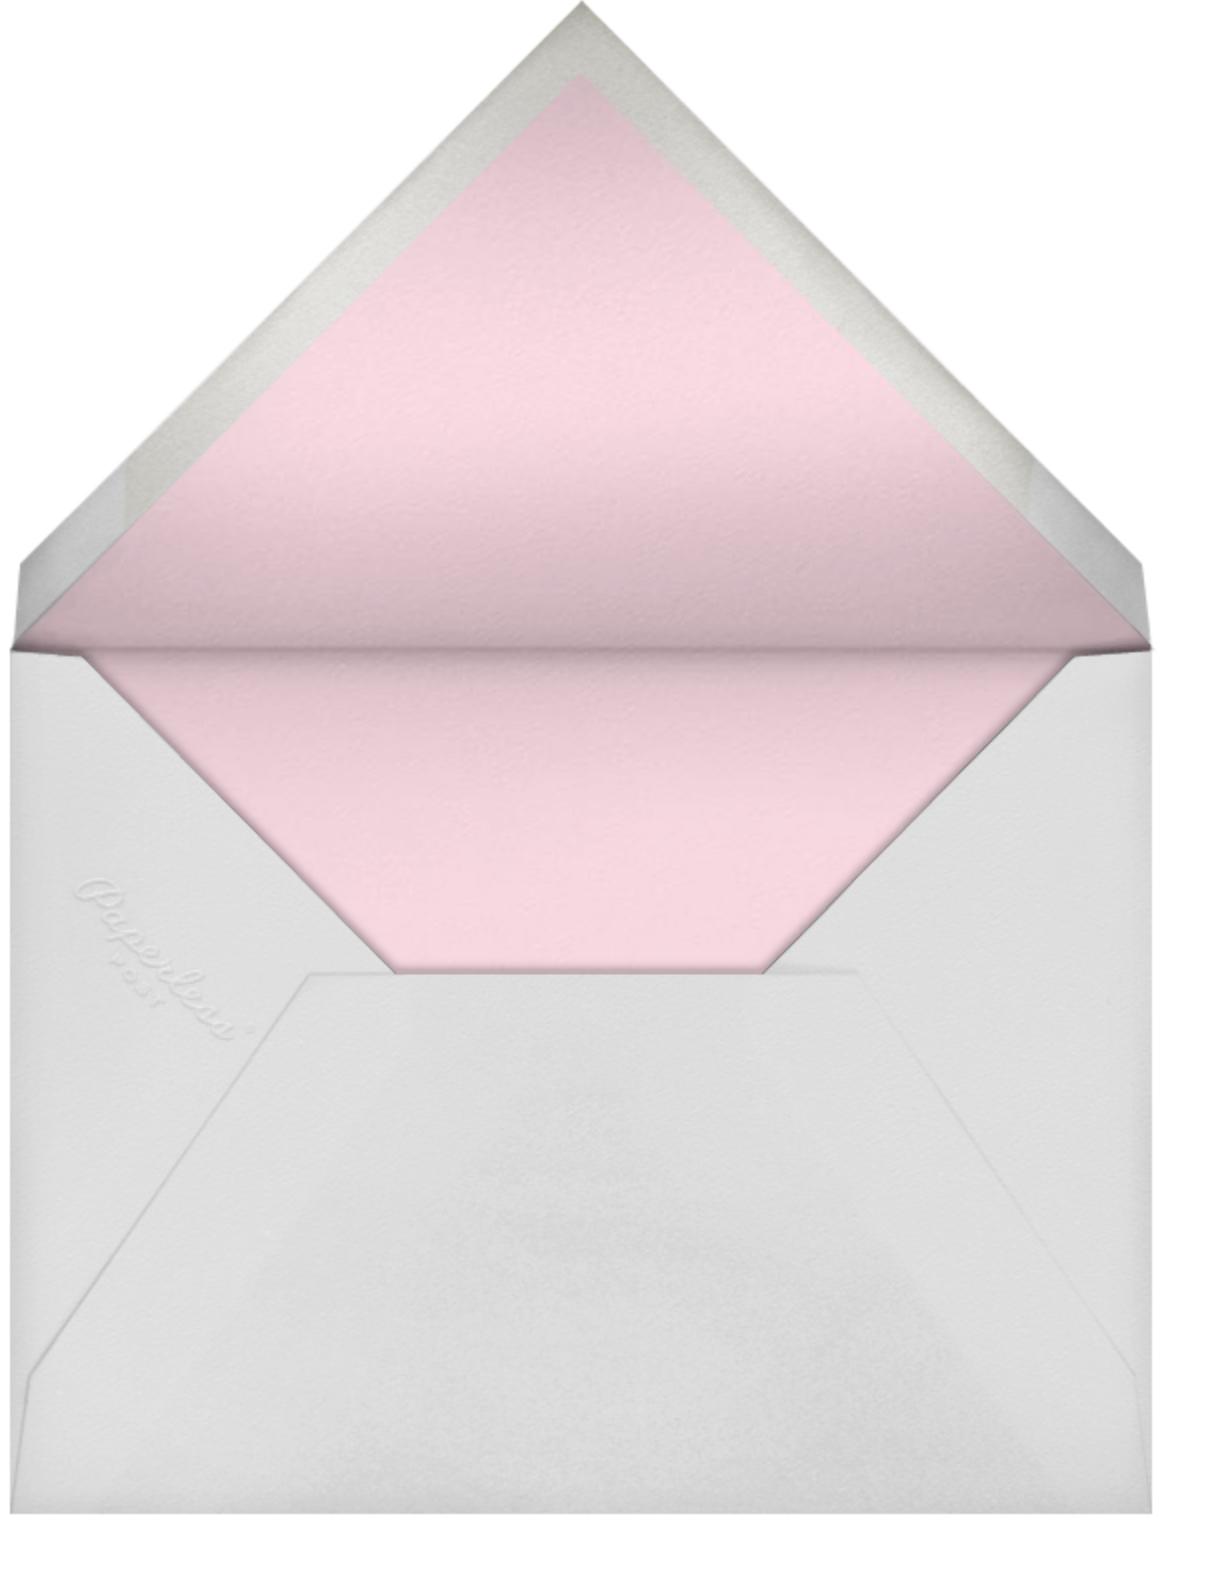 Charity Ribbon - Pink  - Paperless Post - Envelope